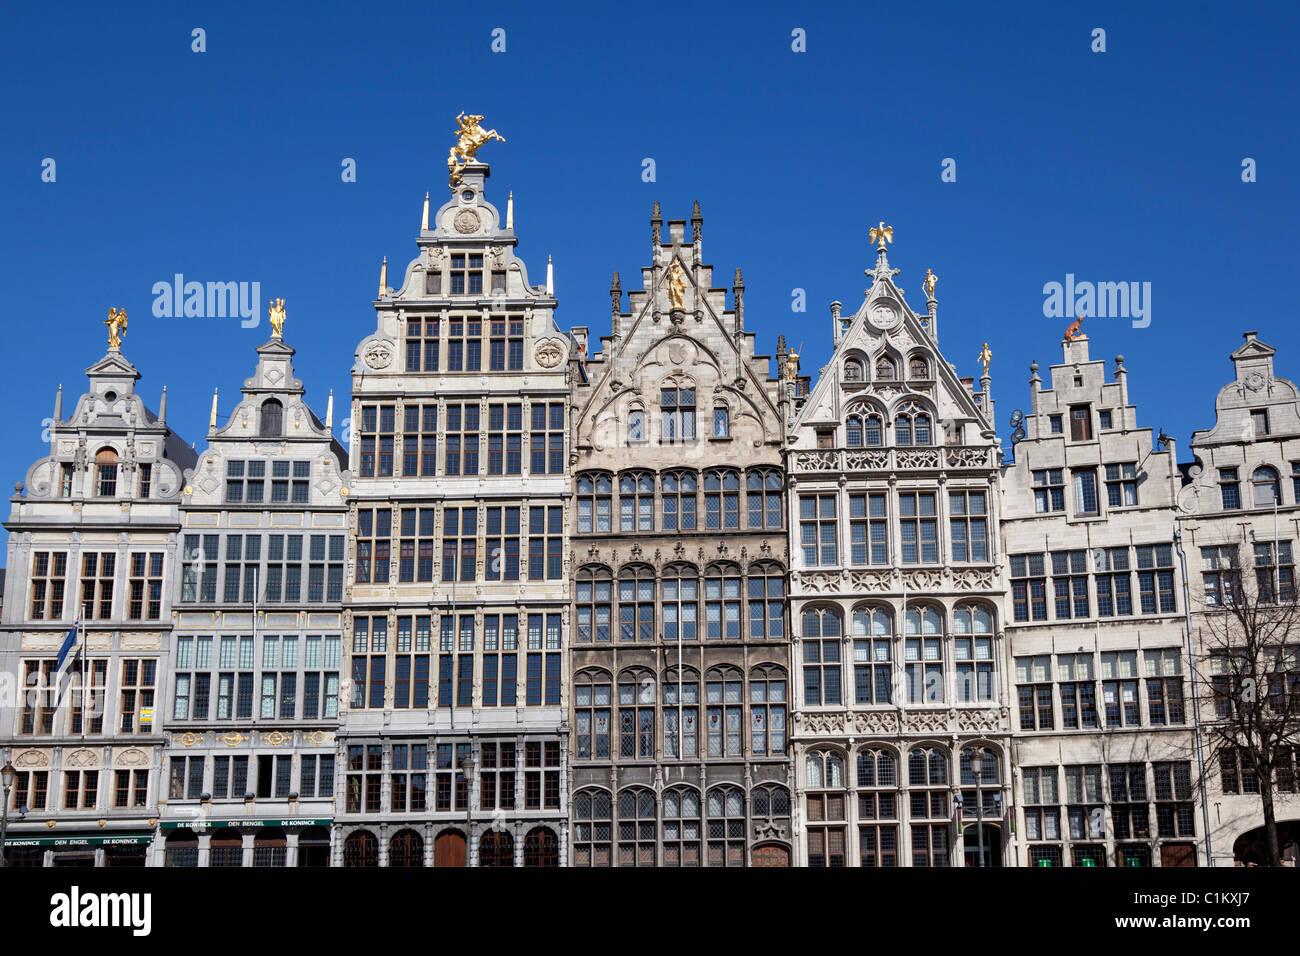 Row of Flemish houses on the Grote markt in Antwerp, Belgium Stock Photo